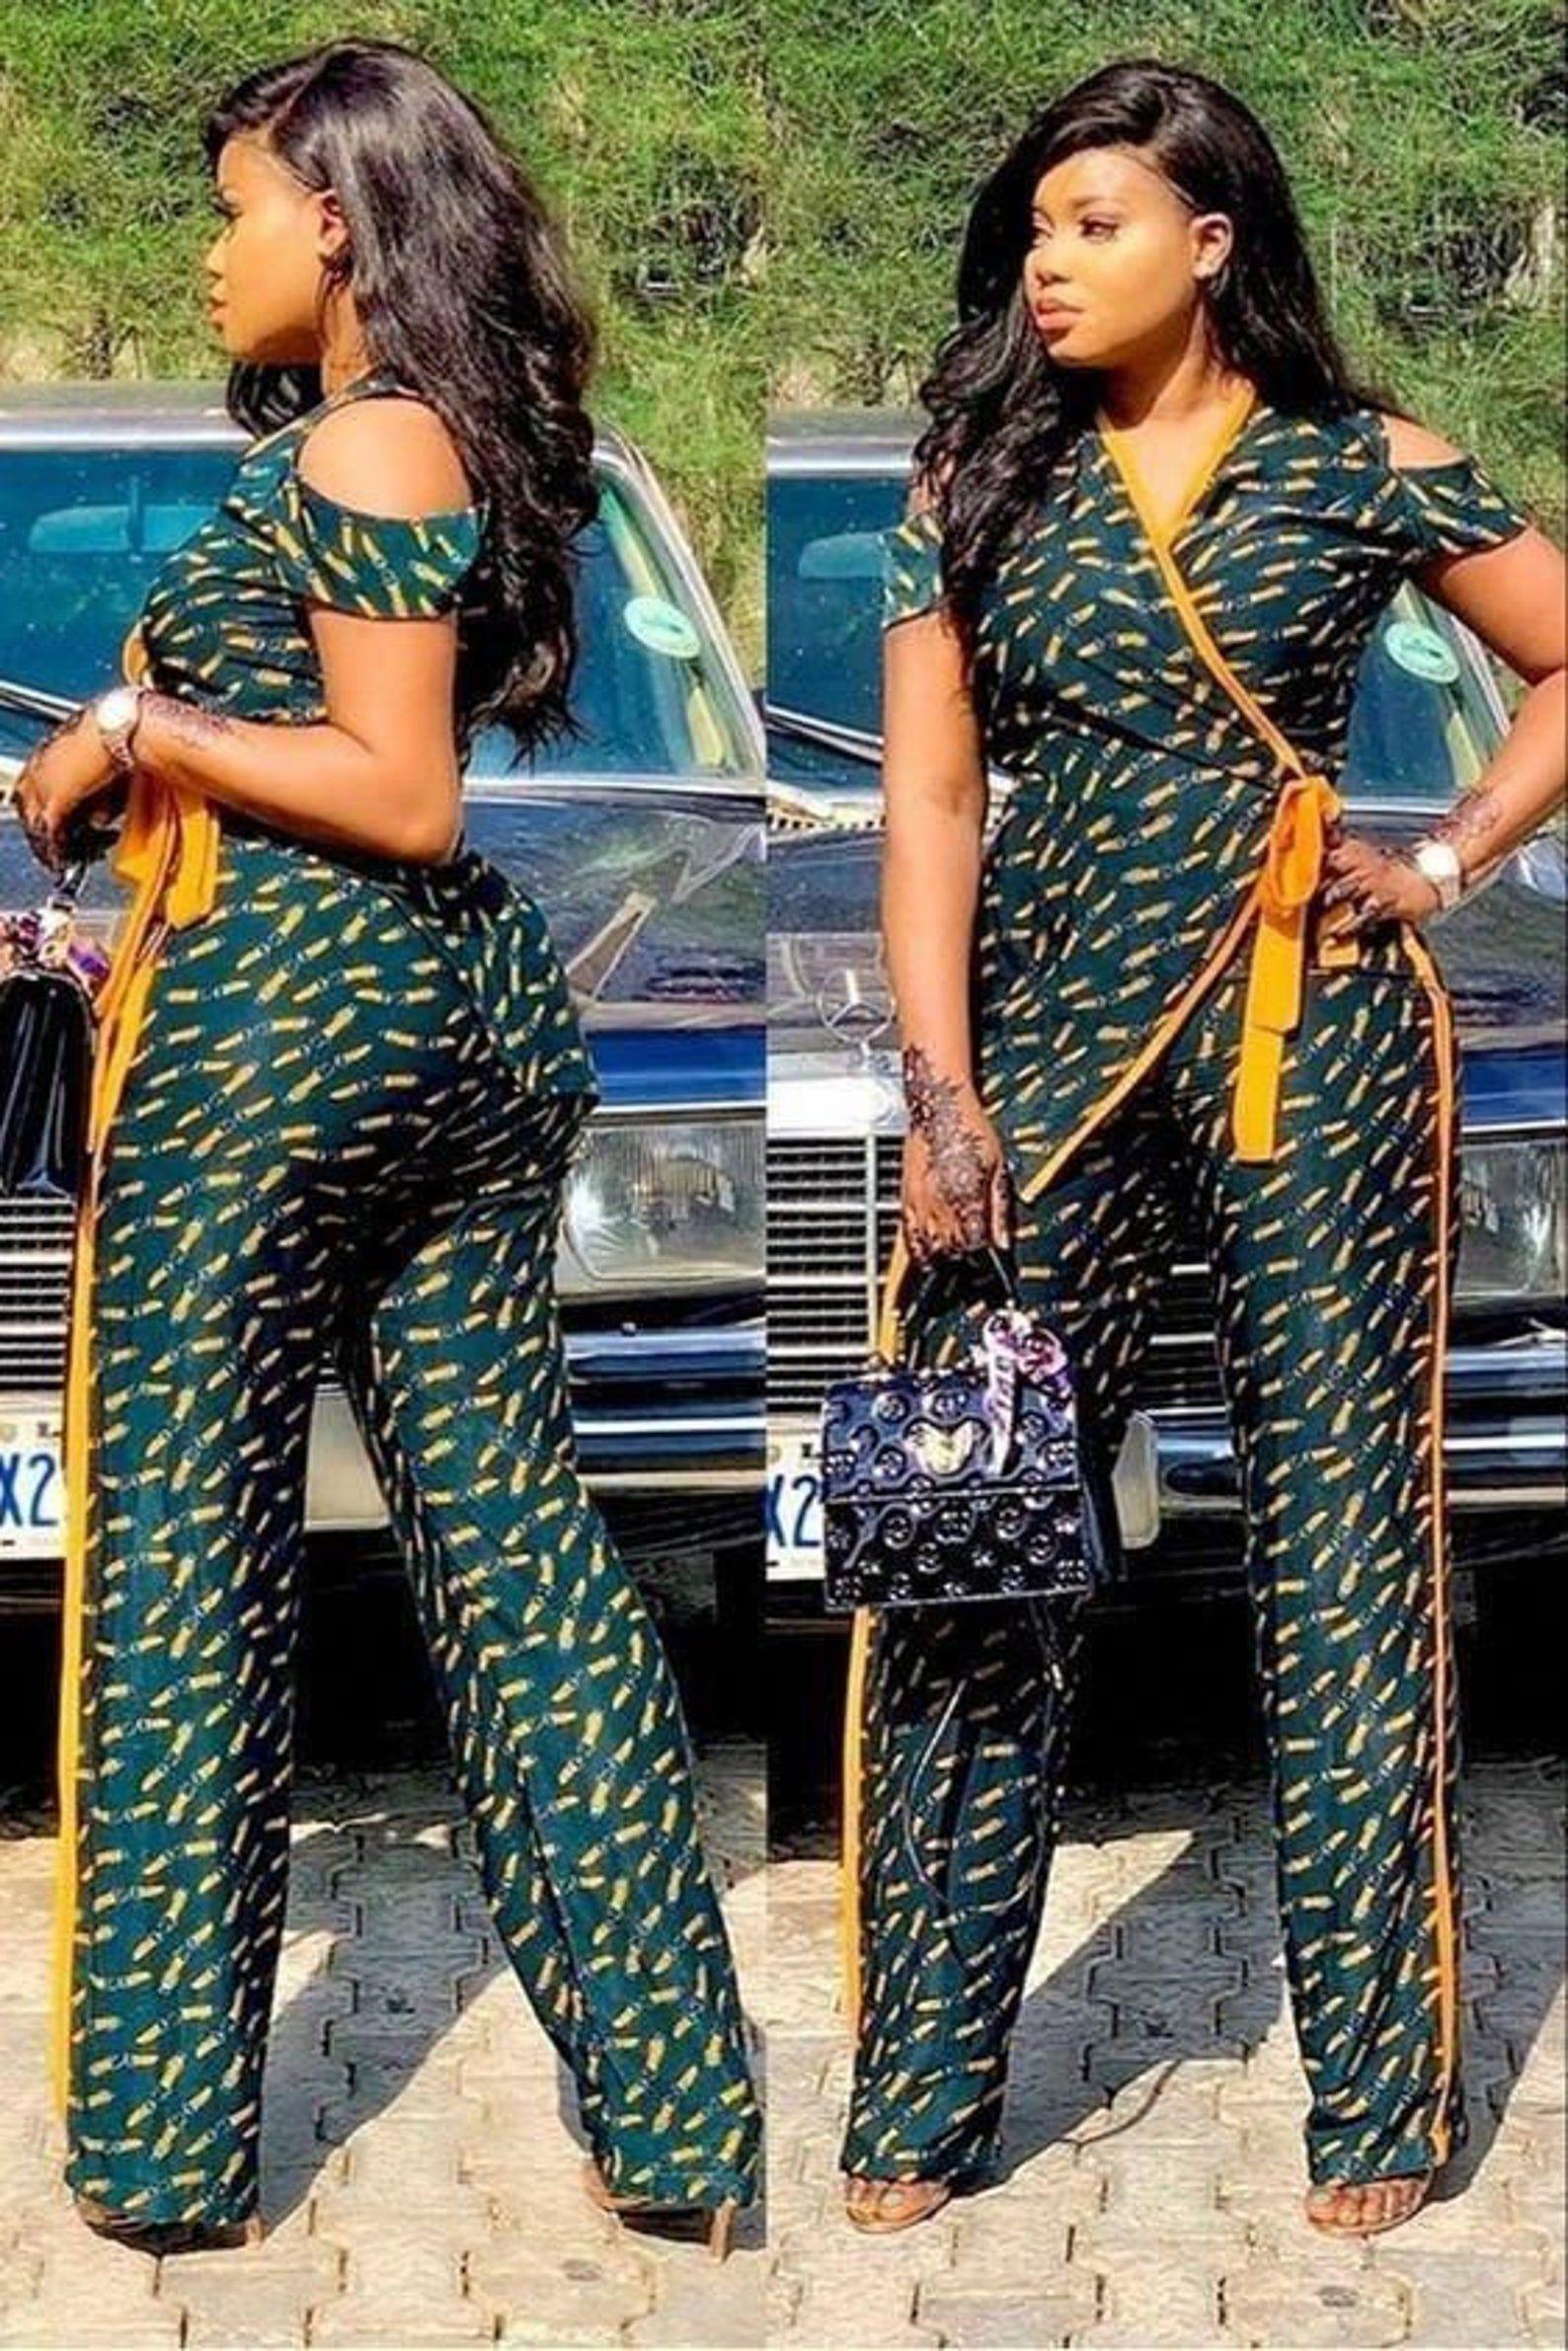 African women/'s clothing,African women/'s outfits African women/'s wedding dress,African women/'s top and pant African women/'s kaftan outfits